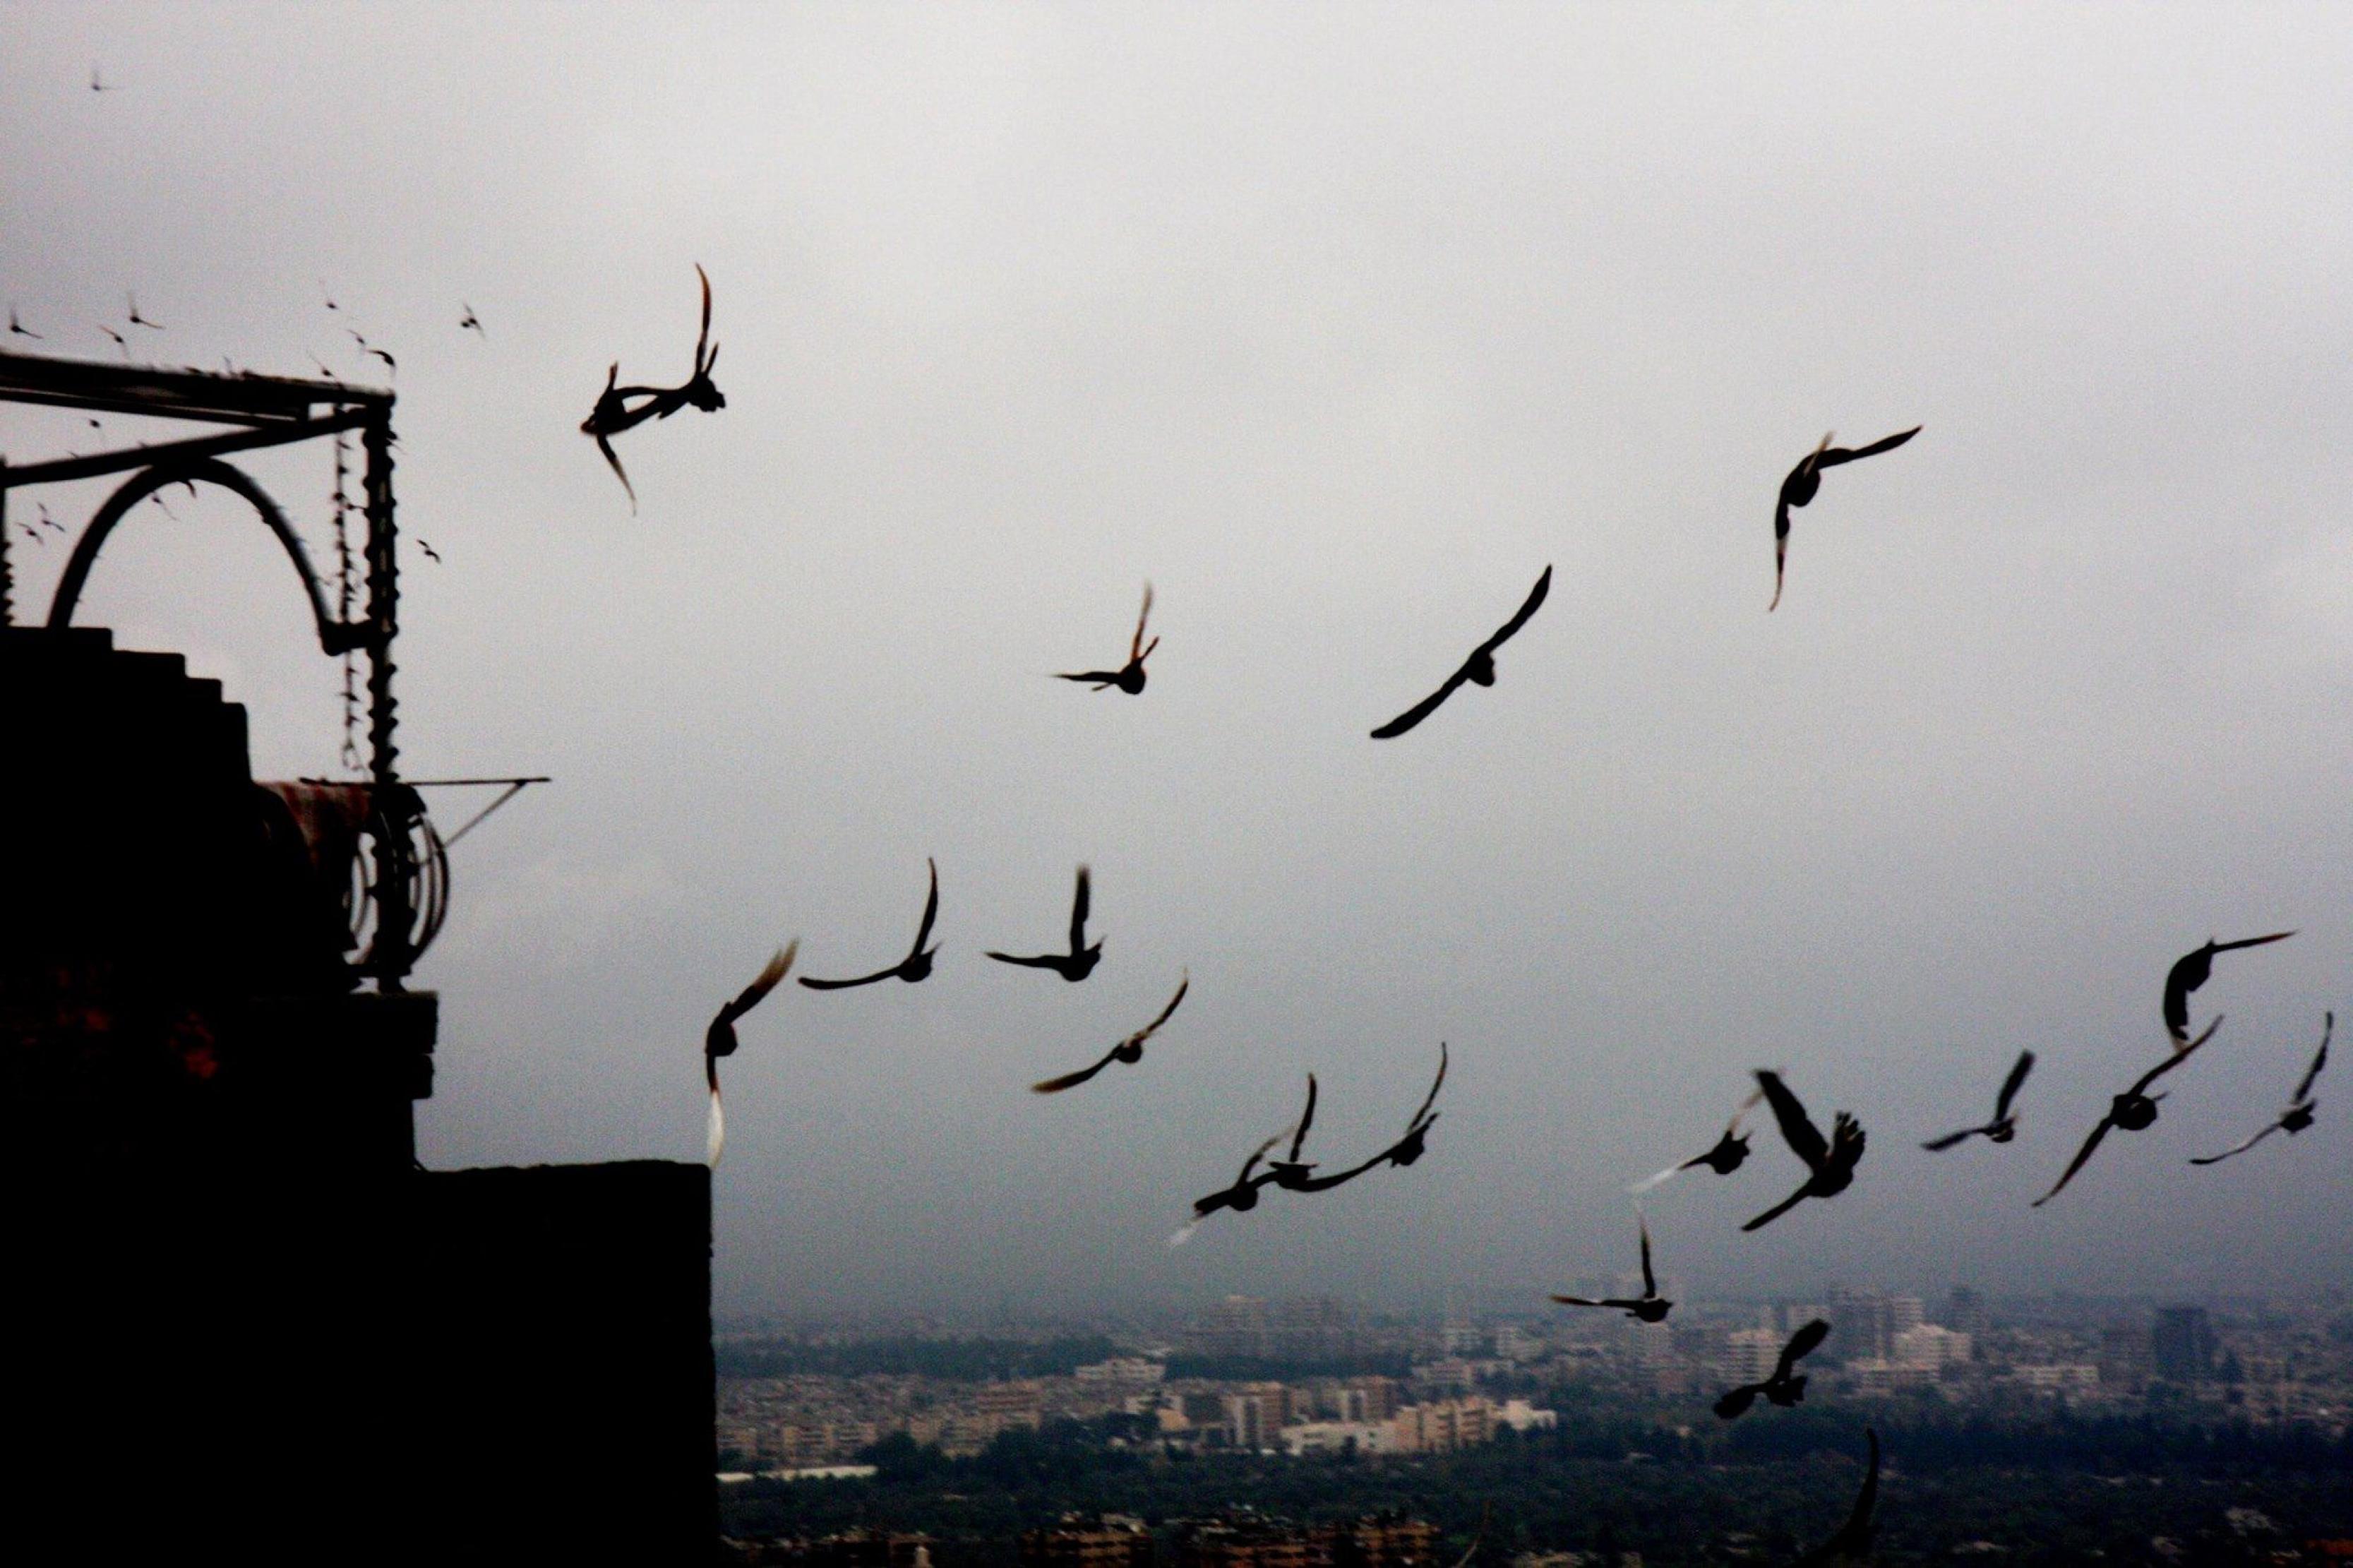 http://images.huffingtonpost.com/2015-12-09-1449627276-8134185-Damascus.jpg